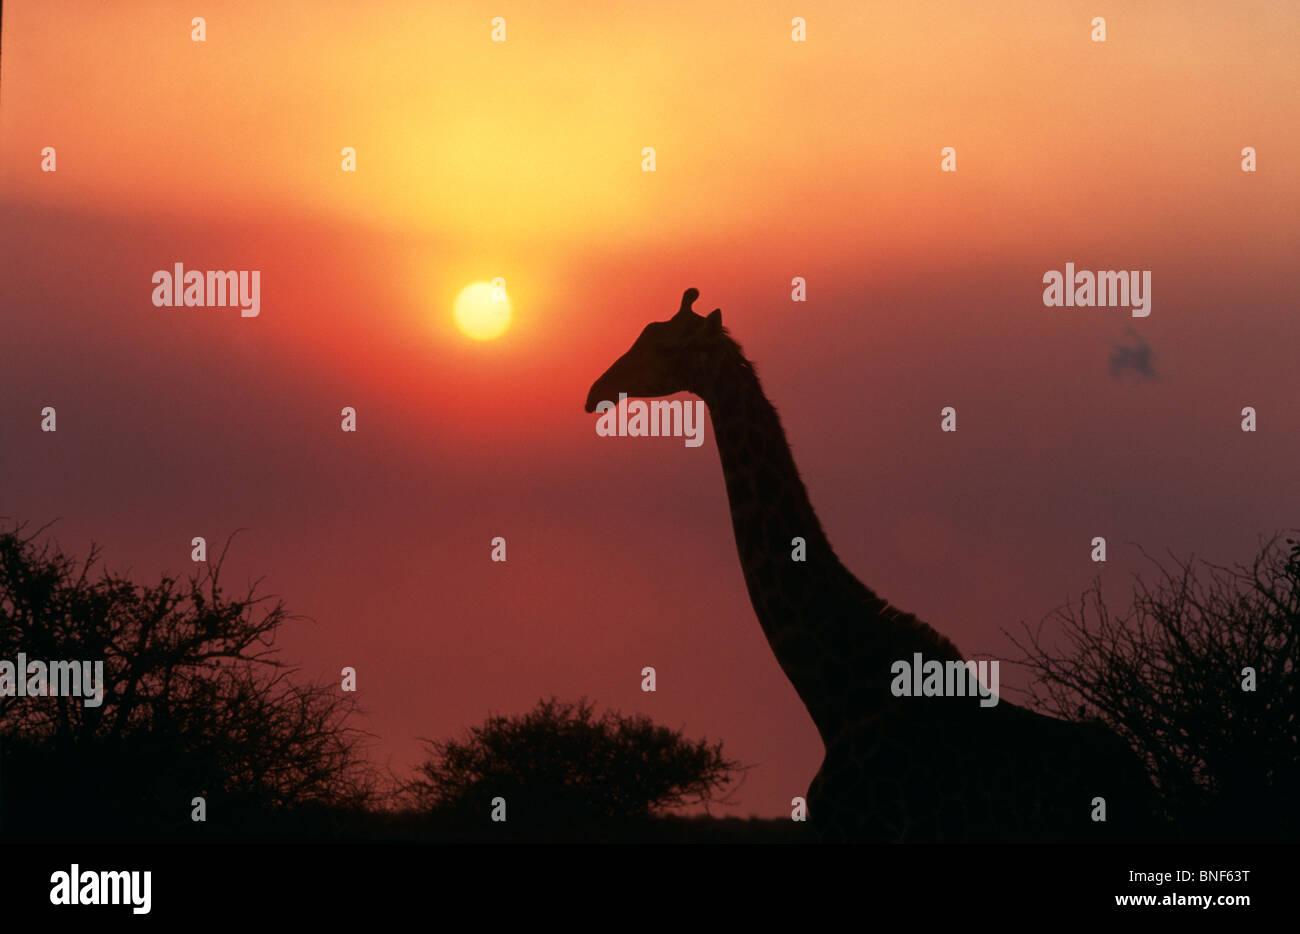 Silueta de la jirafa (Giraffa Camelopardalis) contra el atardecer, Provincia de KwaZulu-Natal, Sudáfrica Imagen De Stock